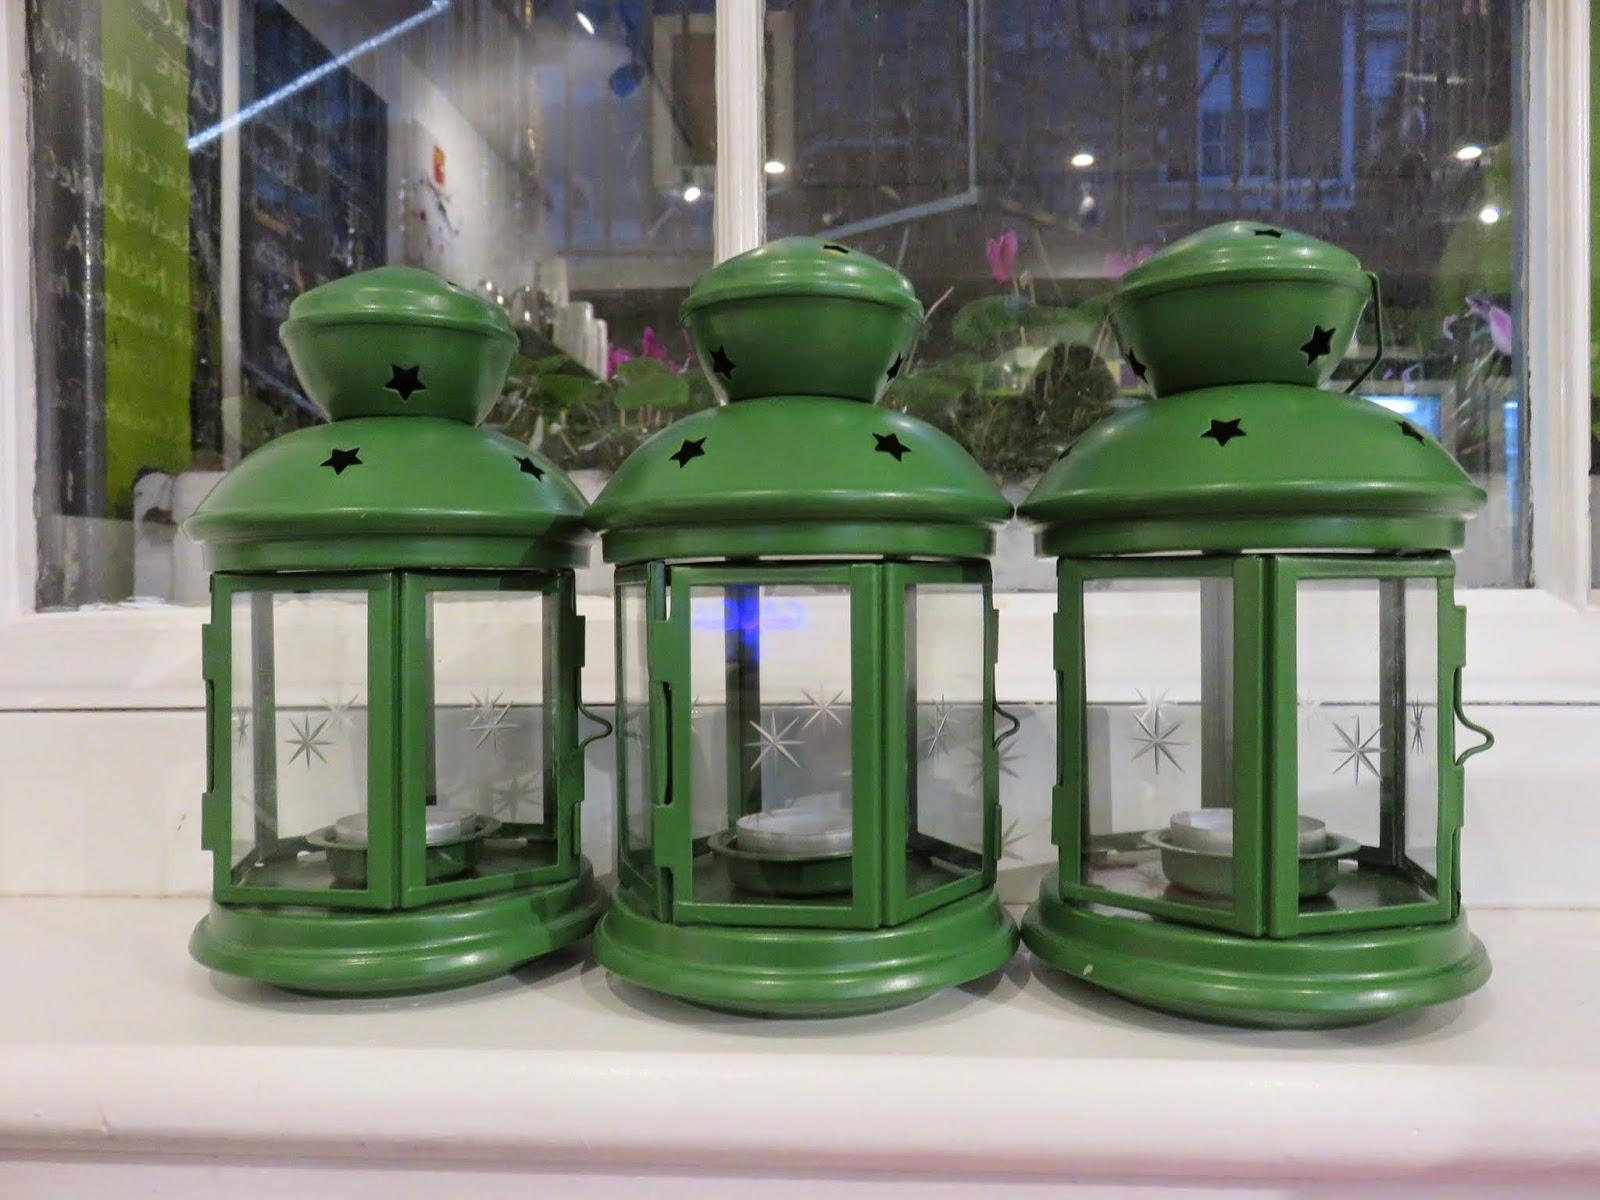 Green lanterns at Sweet Sicily in Dublin